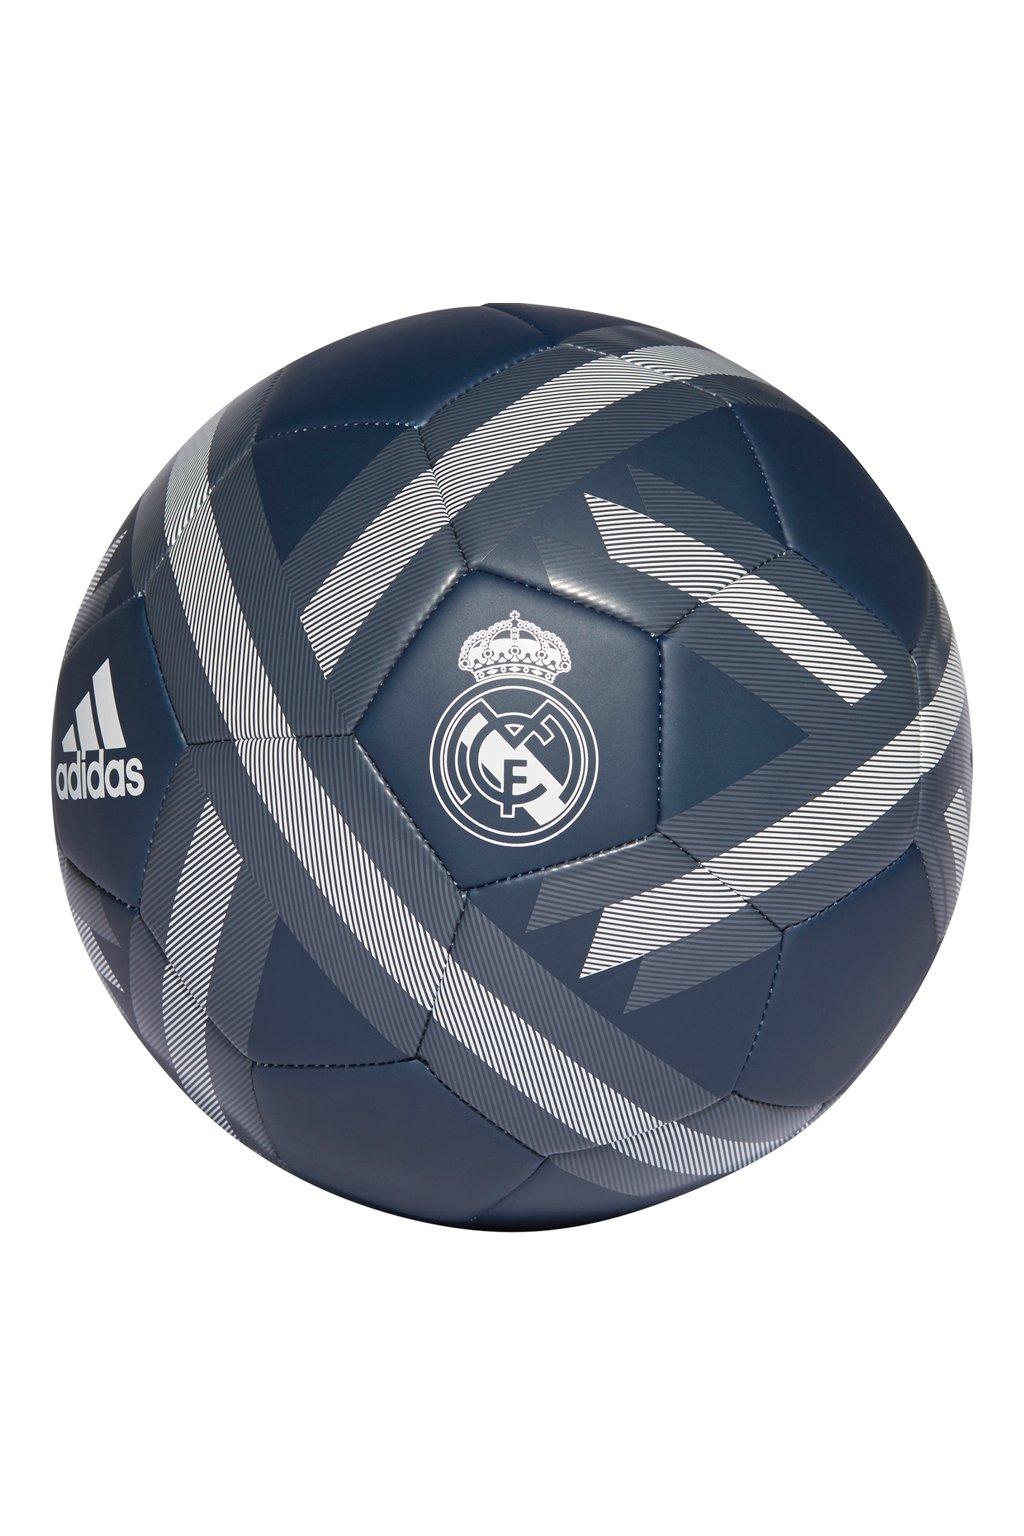 Futbalová lopta Adidas Real Madrid FBL CW4157